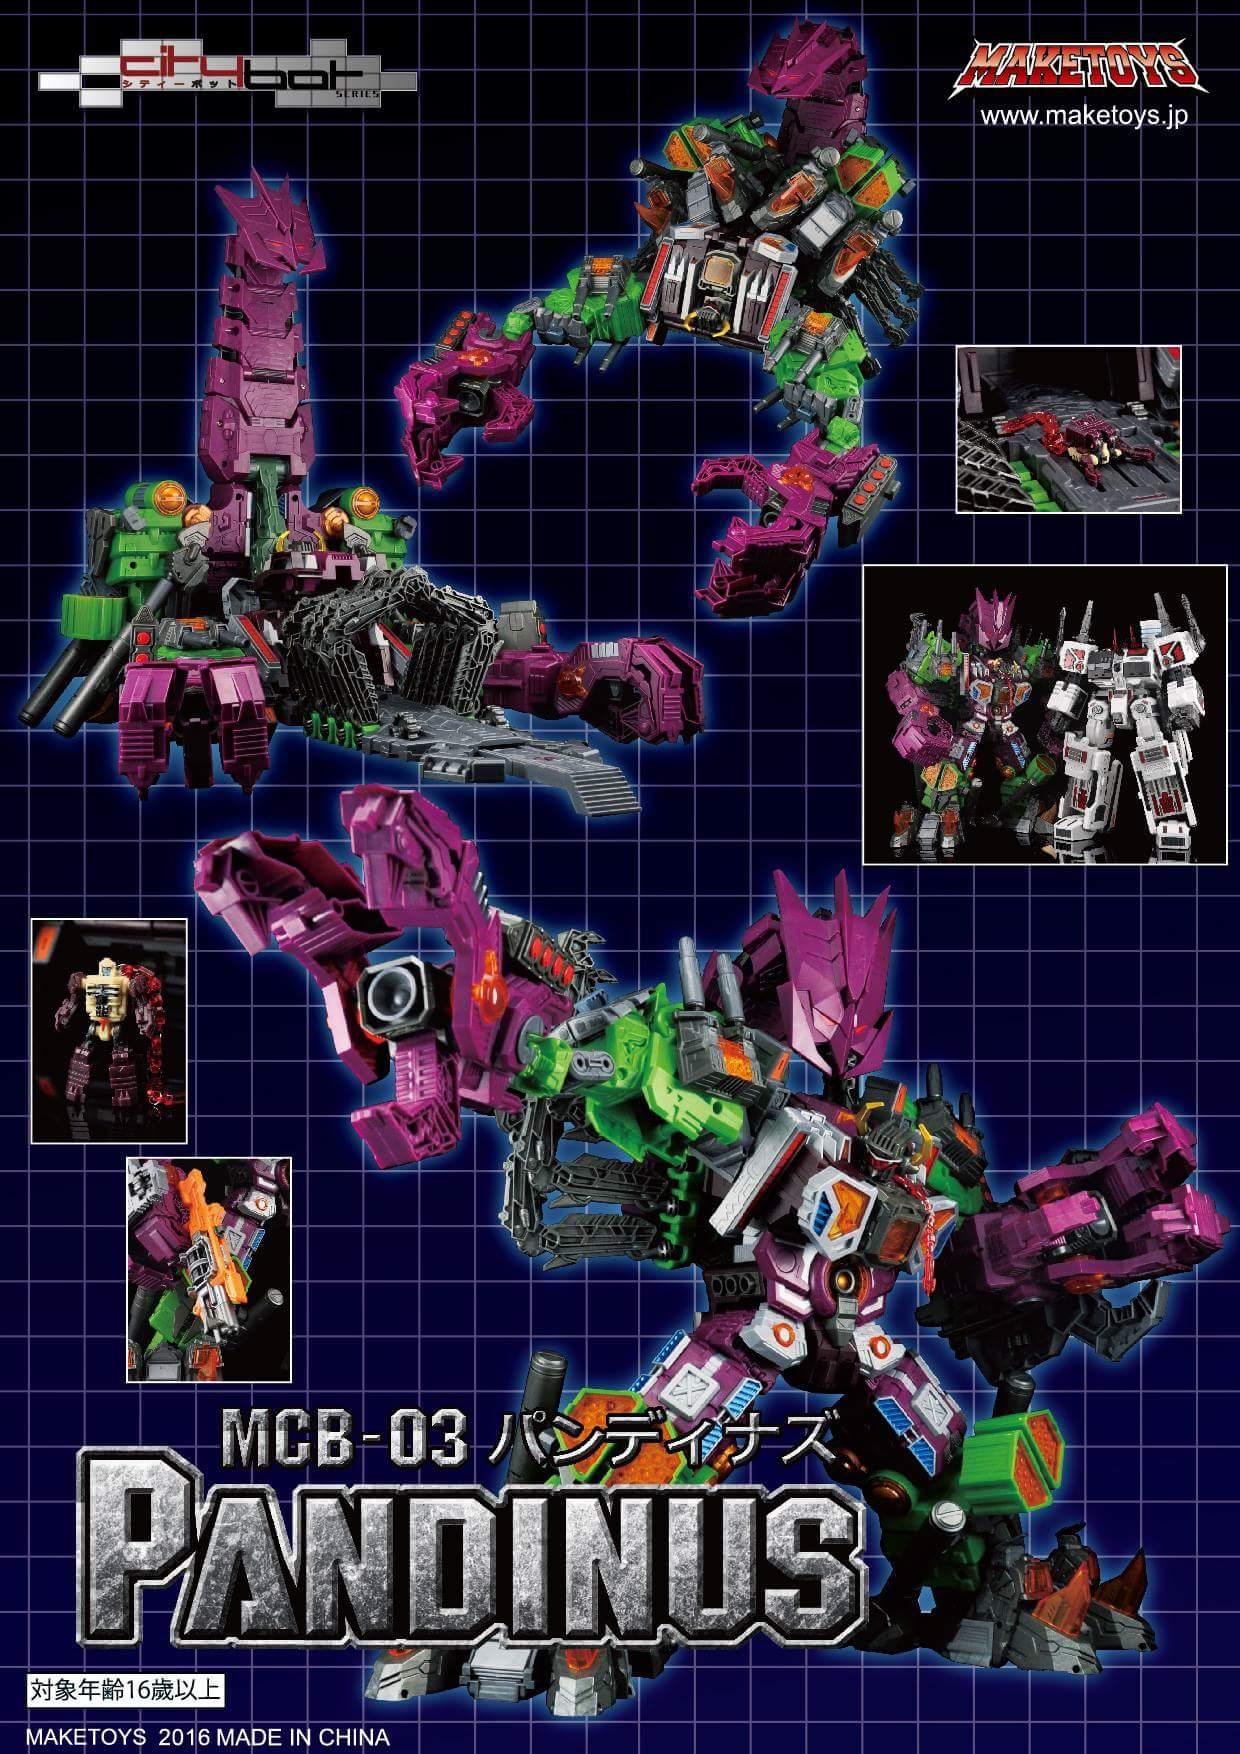 [Maketoys] Produit Tiers - Jouet MCB-03 Pandinus - aka Scorponok et MCB-03D Devil Stinger - aka Black Zarak AY3Kk0PB